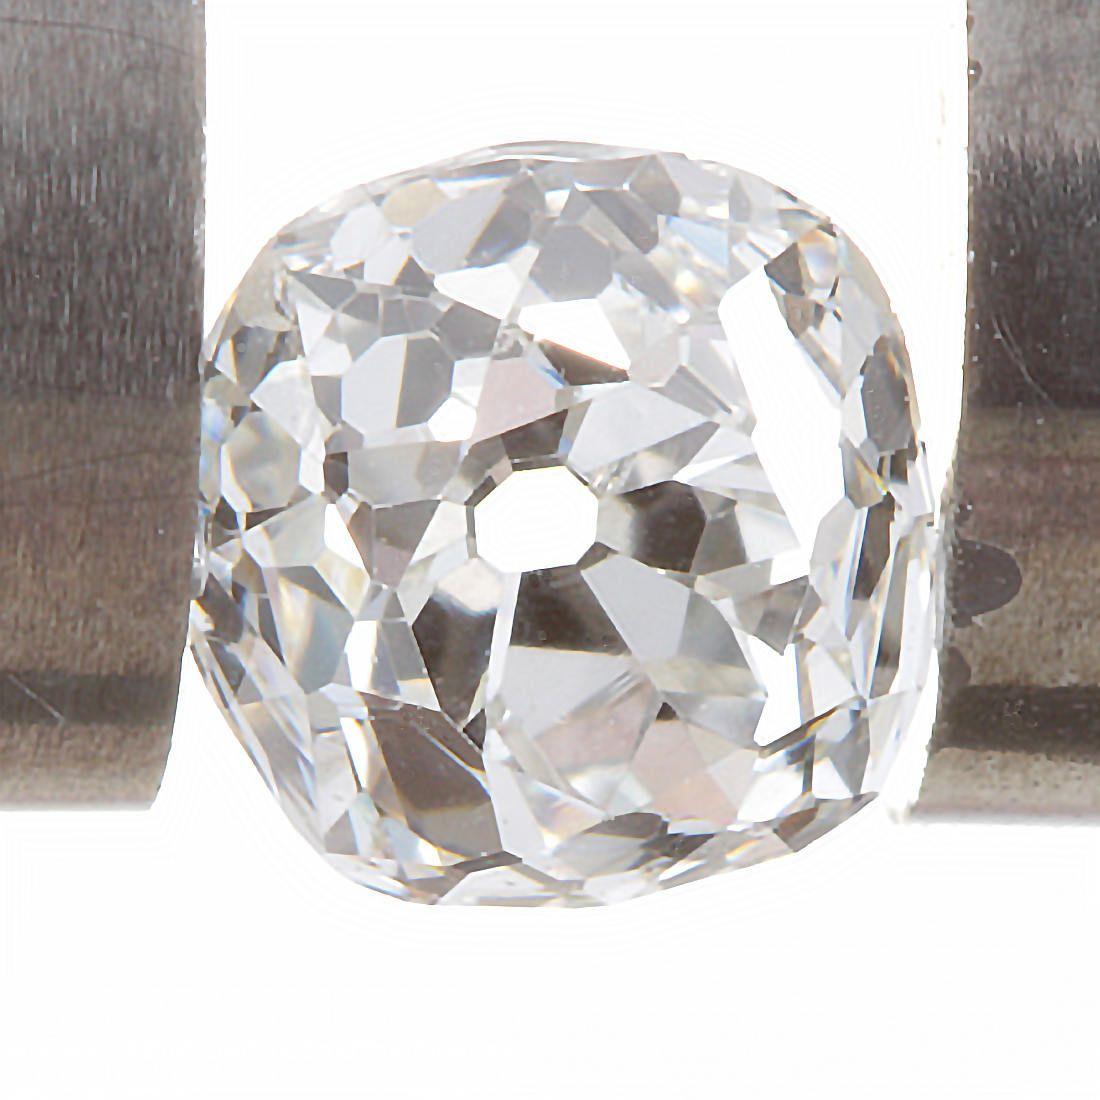 Diamond loose old mine cut .34 carat antique vintage   H-i   VS2 - Si1   antique cushion brilliant cut diamond   circa 1800's by DavidJThomasJewelry on Etsy